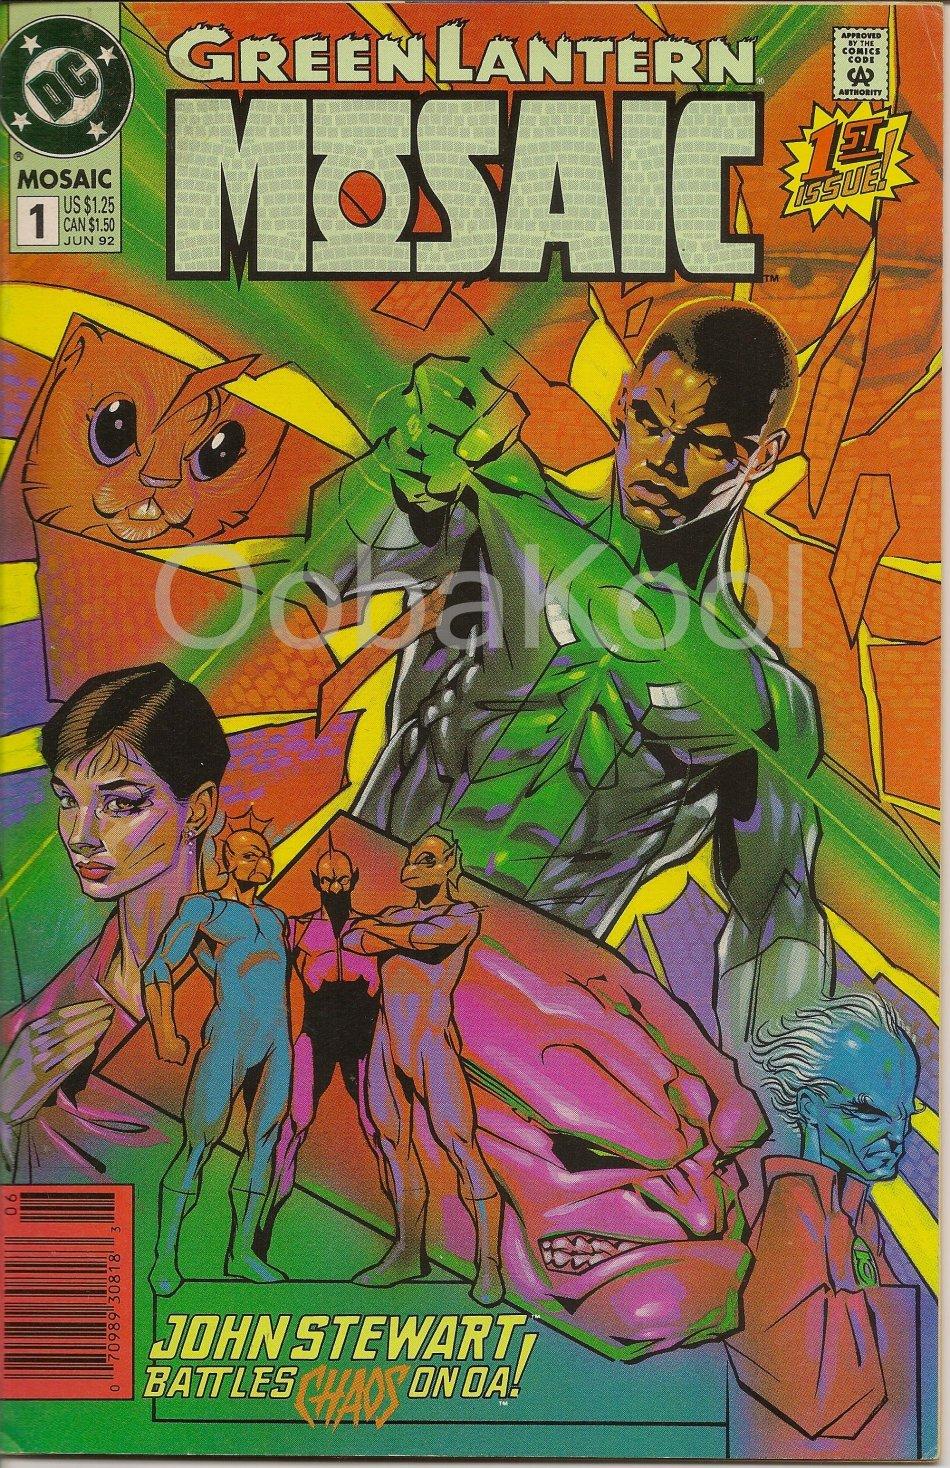 John persons comics for sale - Super Sale Green Lantern John Steward Battles Chaos On Oa Dc Comics 1 June 1992 Oobakool